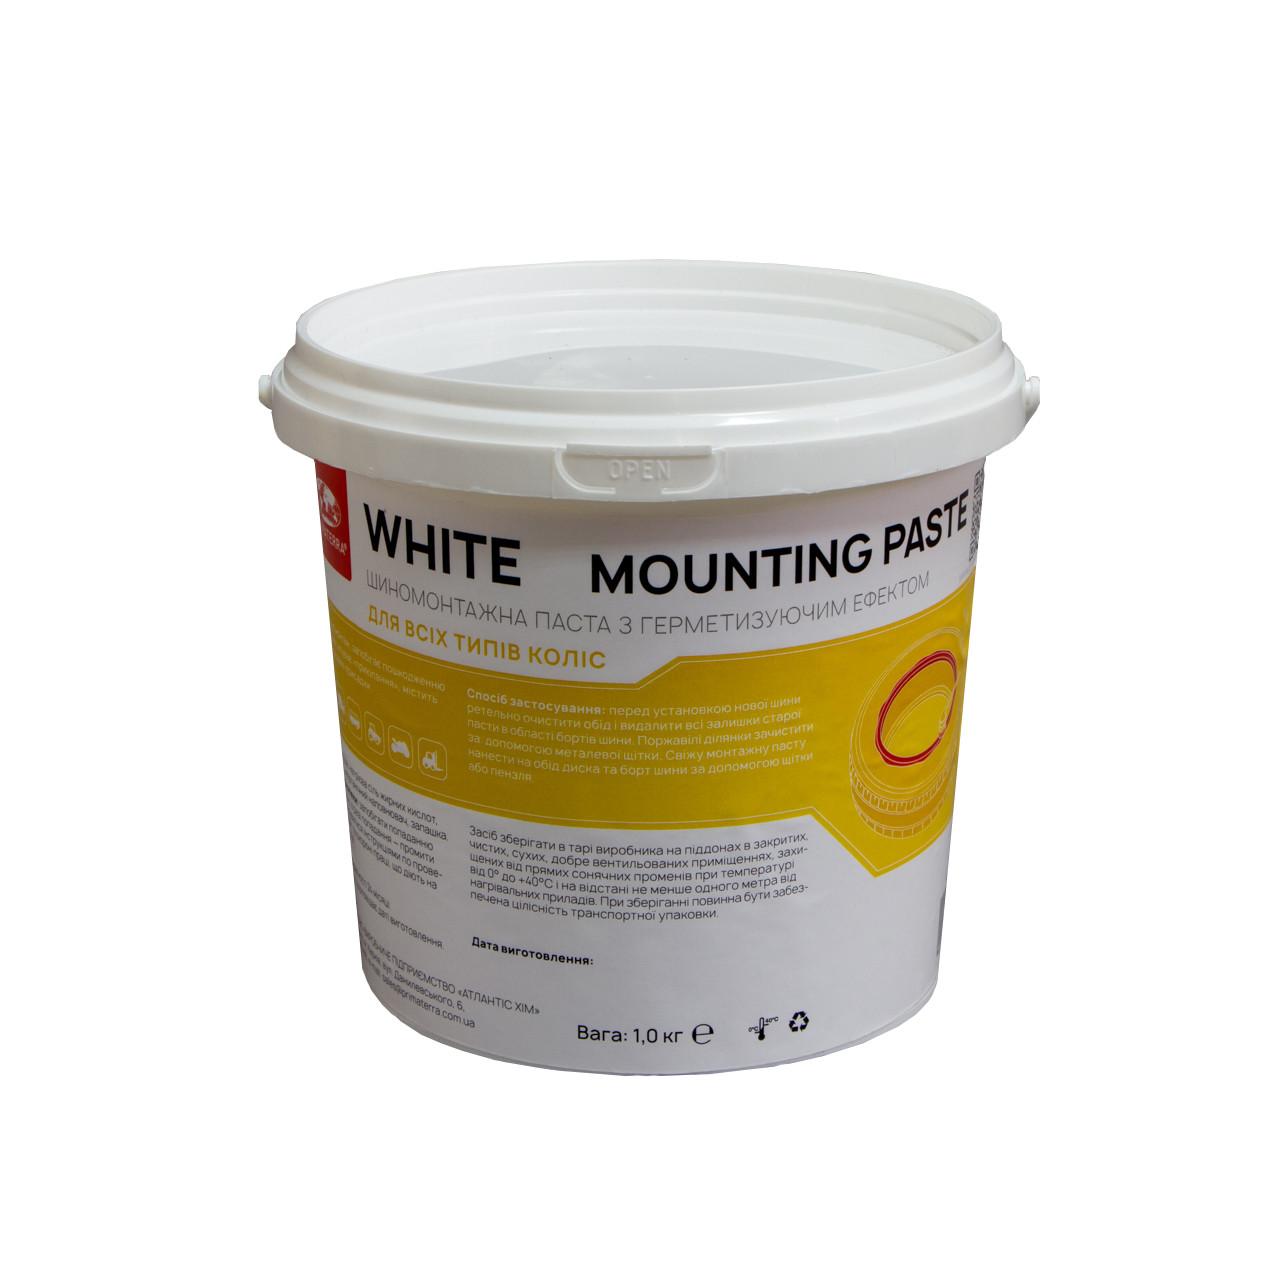 Шиномонтажна паста WHITE (БІЛА, з герметизуючим ефектом, щільна), 1кг